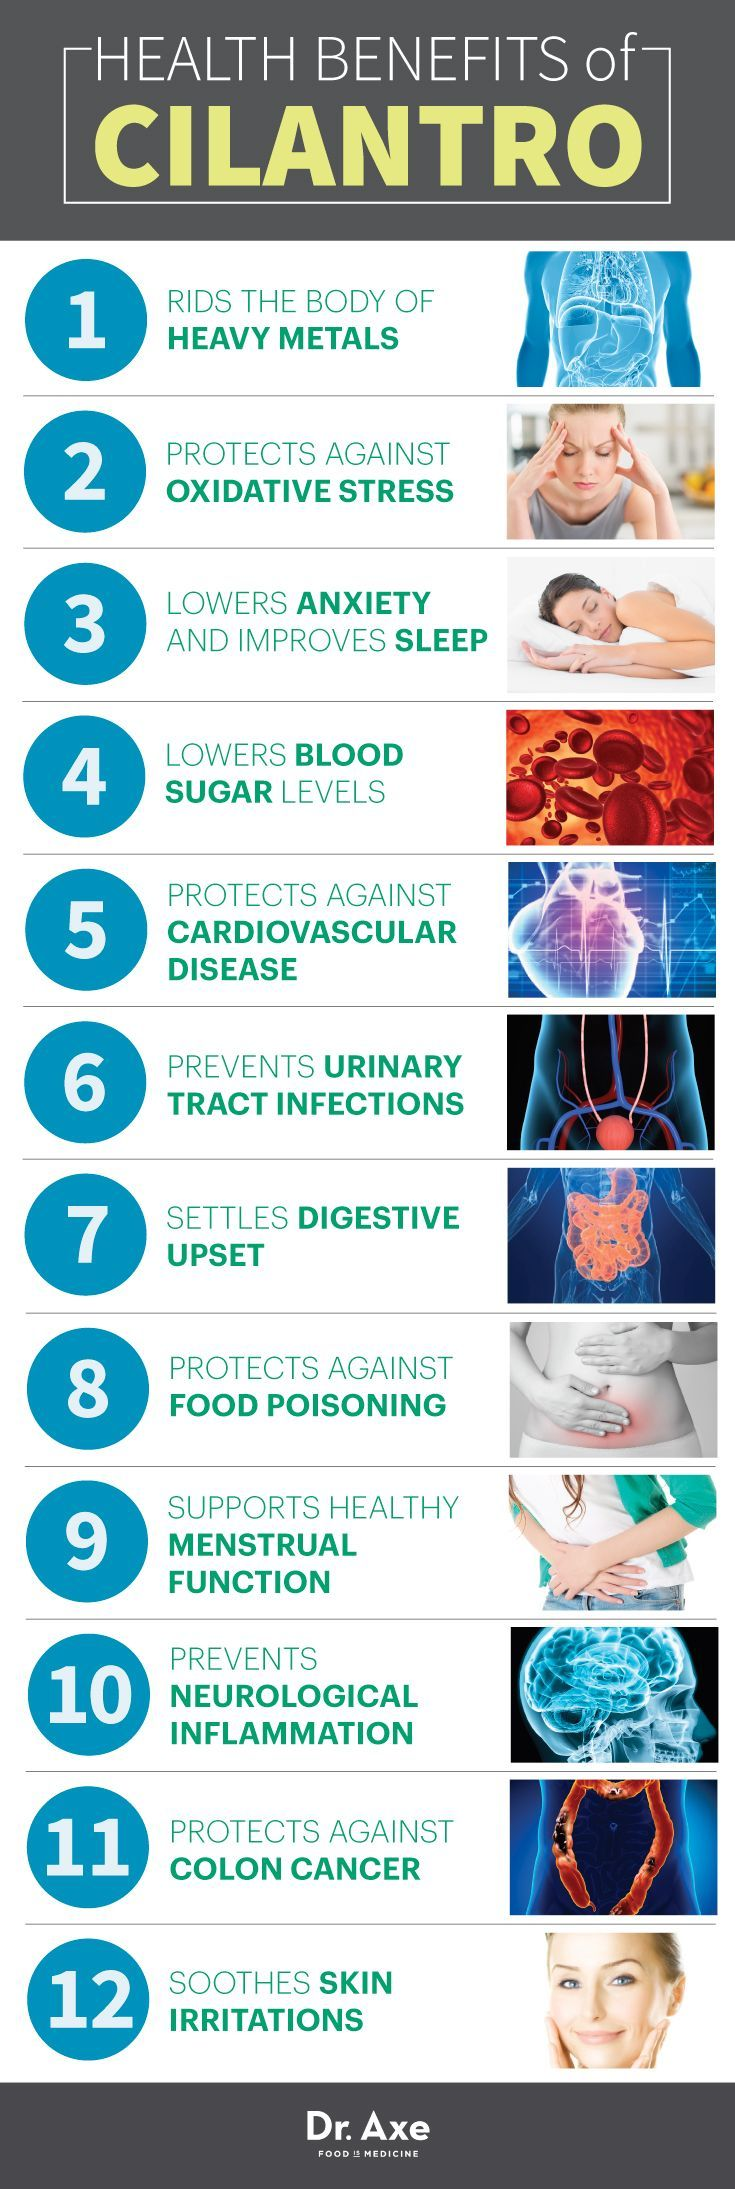 12 Cilantro Benefits, Nutrition & Recipes – Steve at Good Habits, Self Help & Mindful Living